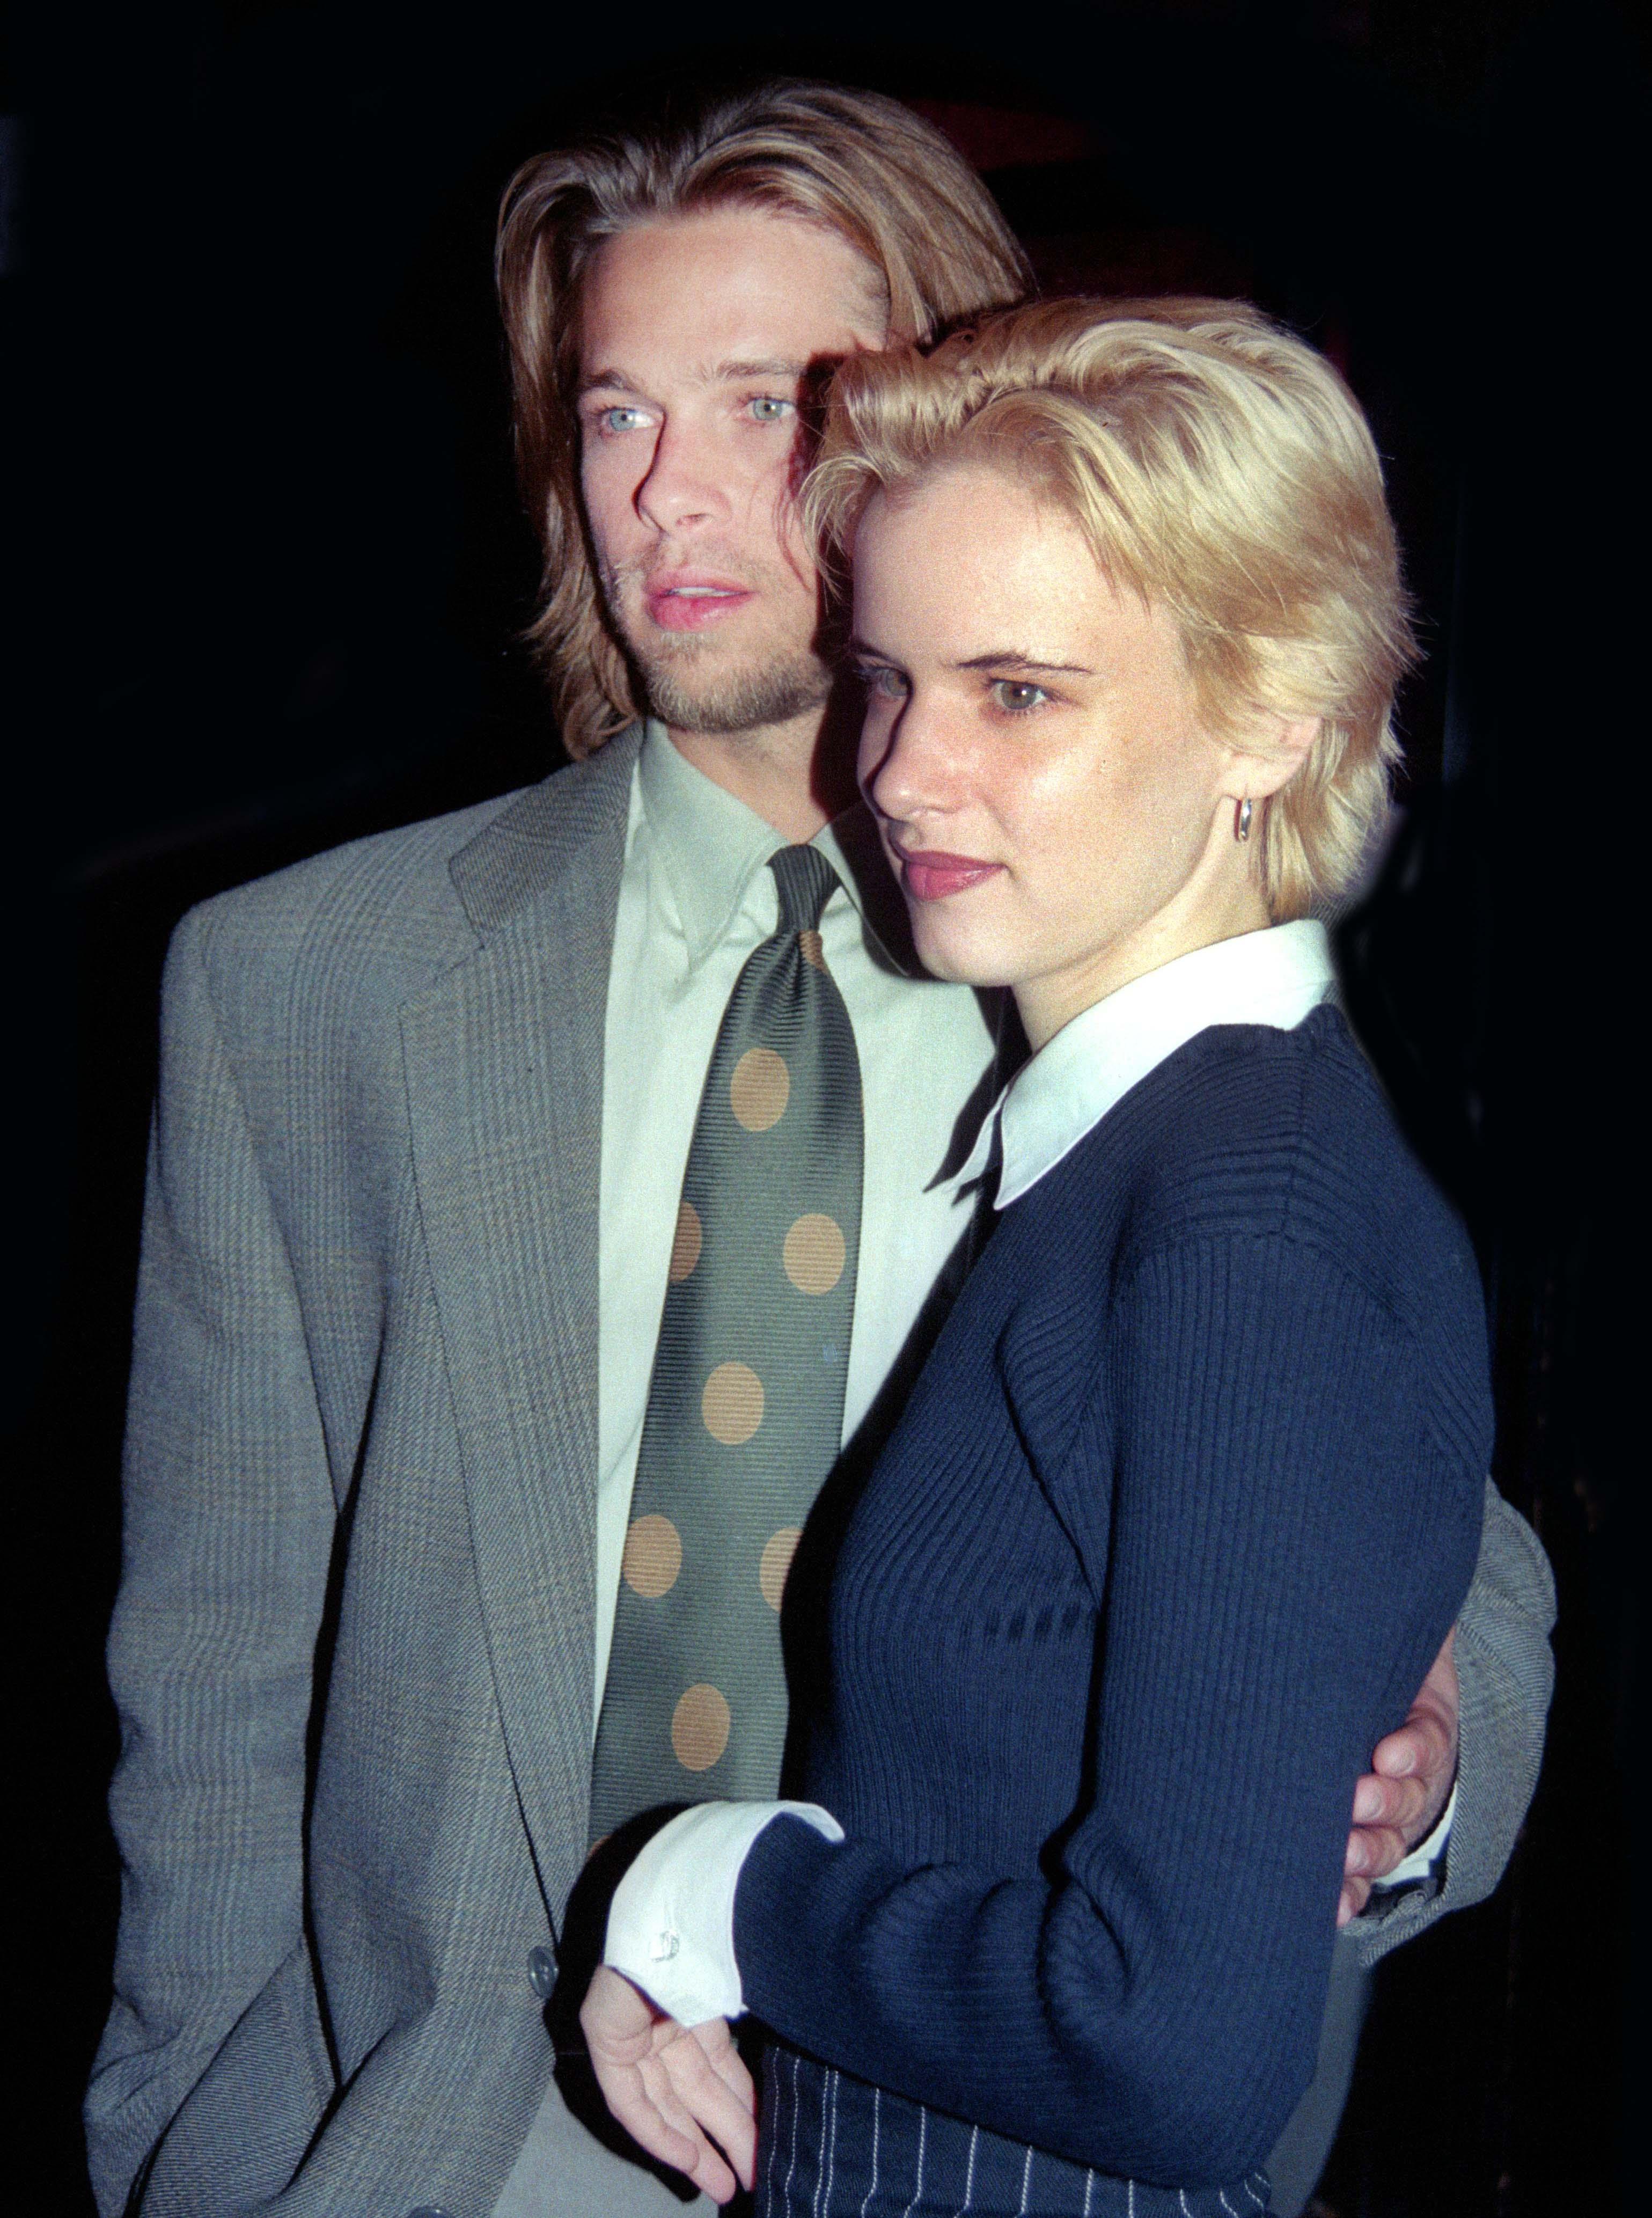 Brad Pitt dating historie